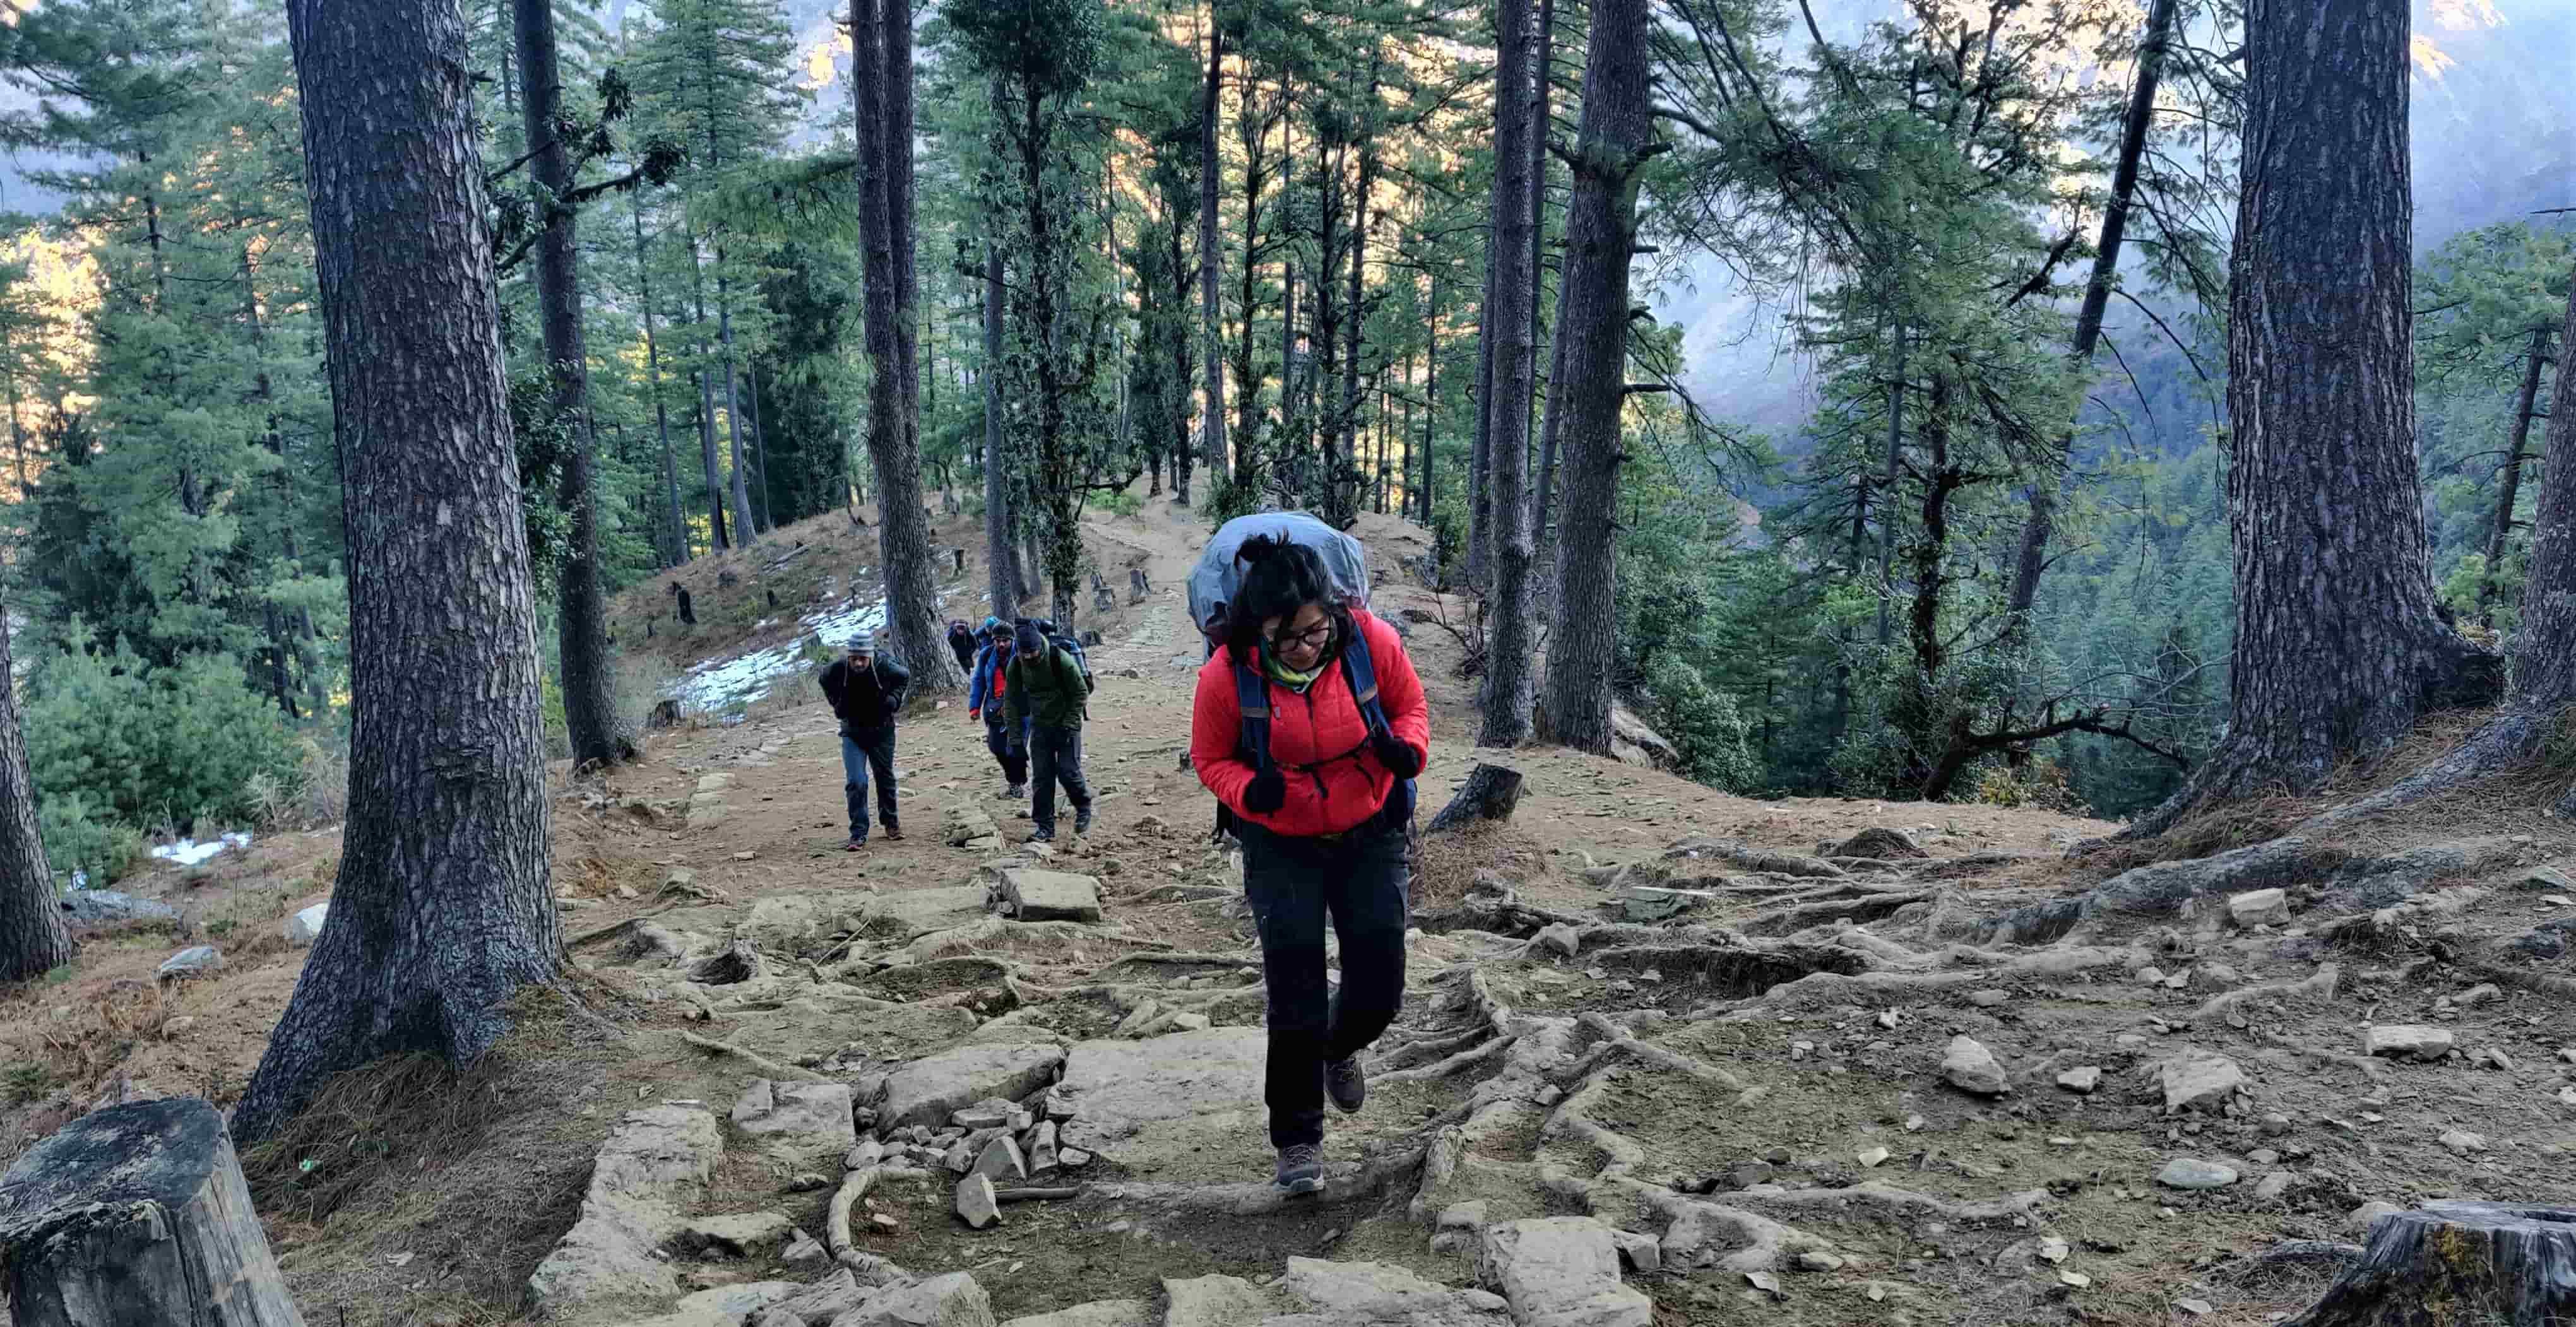 The 5 Wonderful Reasons Why I Trek - Ruchi Rana